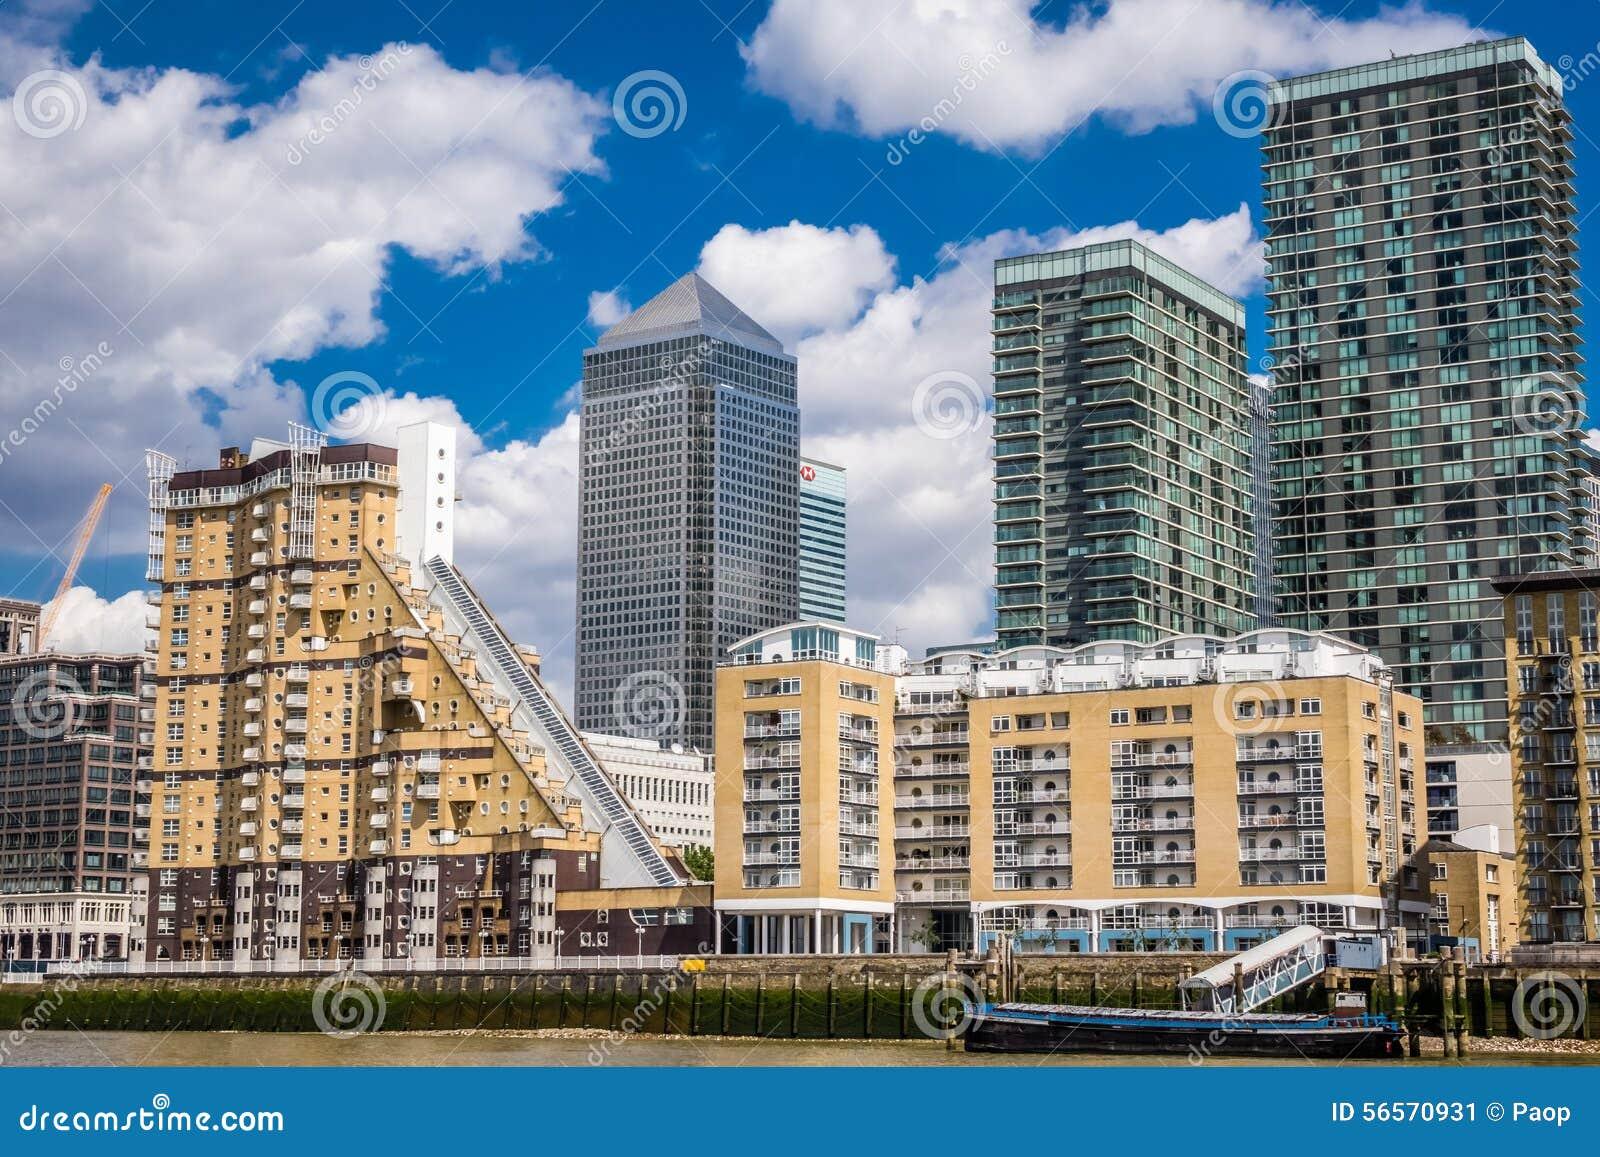 Download Ορίζοντας Canary Wharf εκδοτική εικόνες. εικόνα από συγκεκριμένος - 56570931